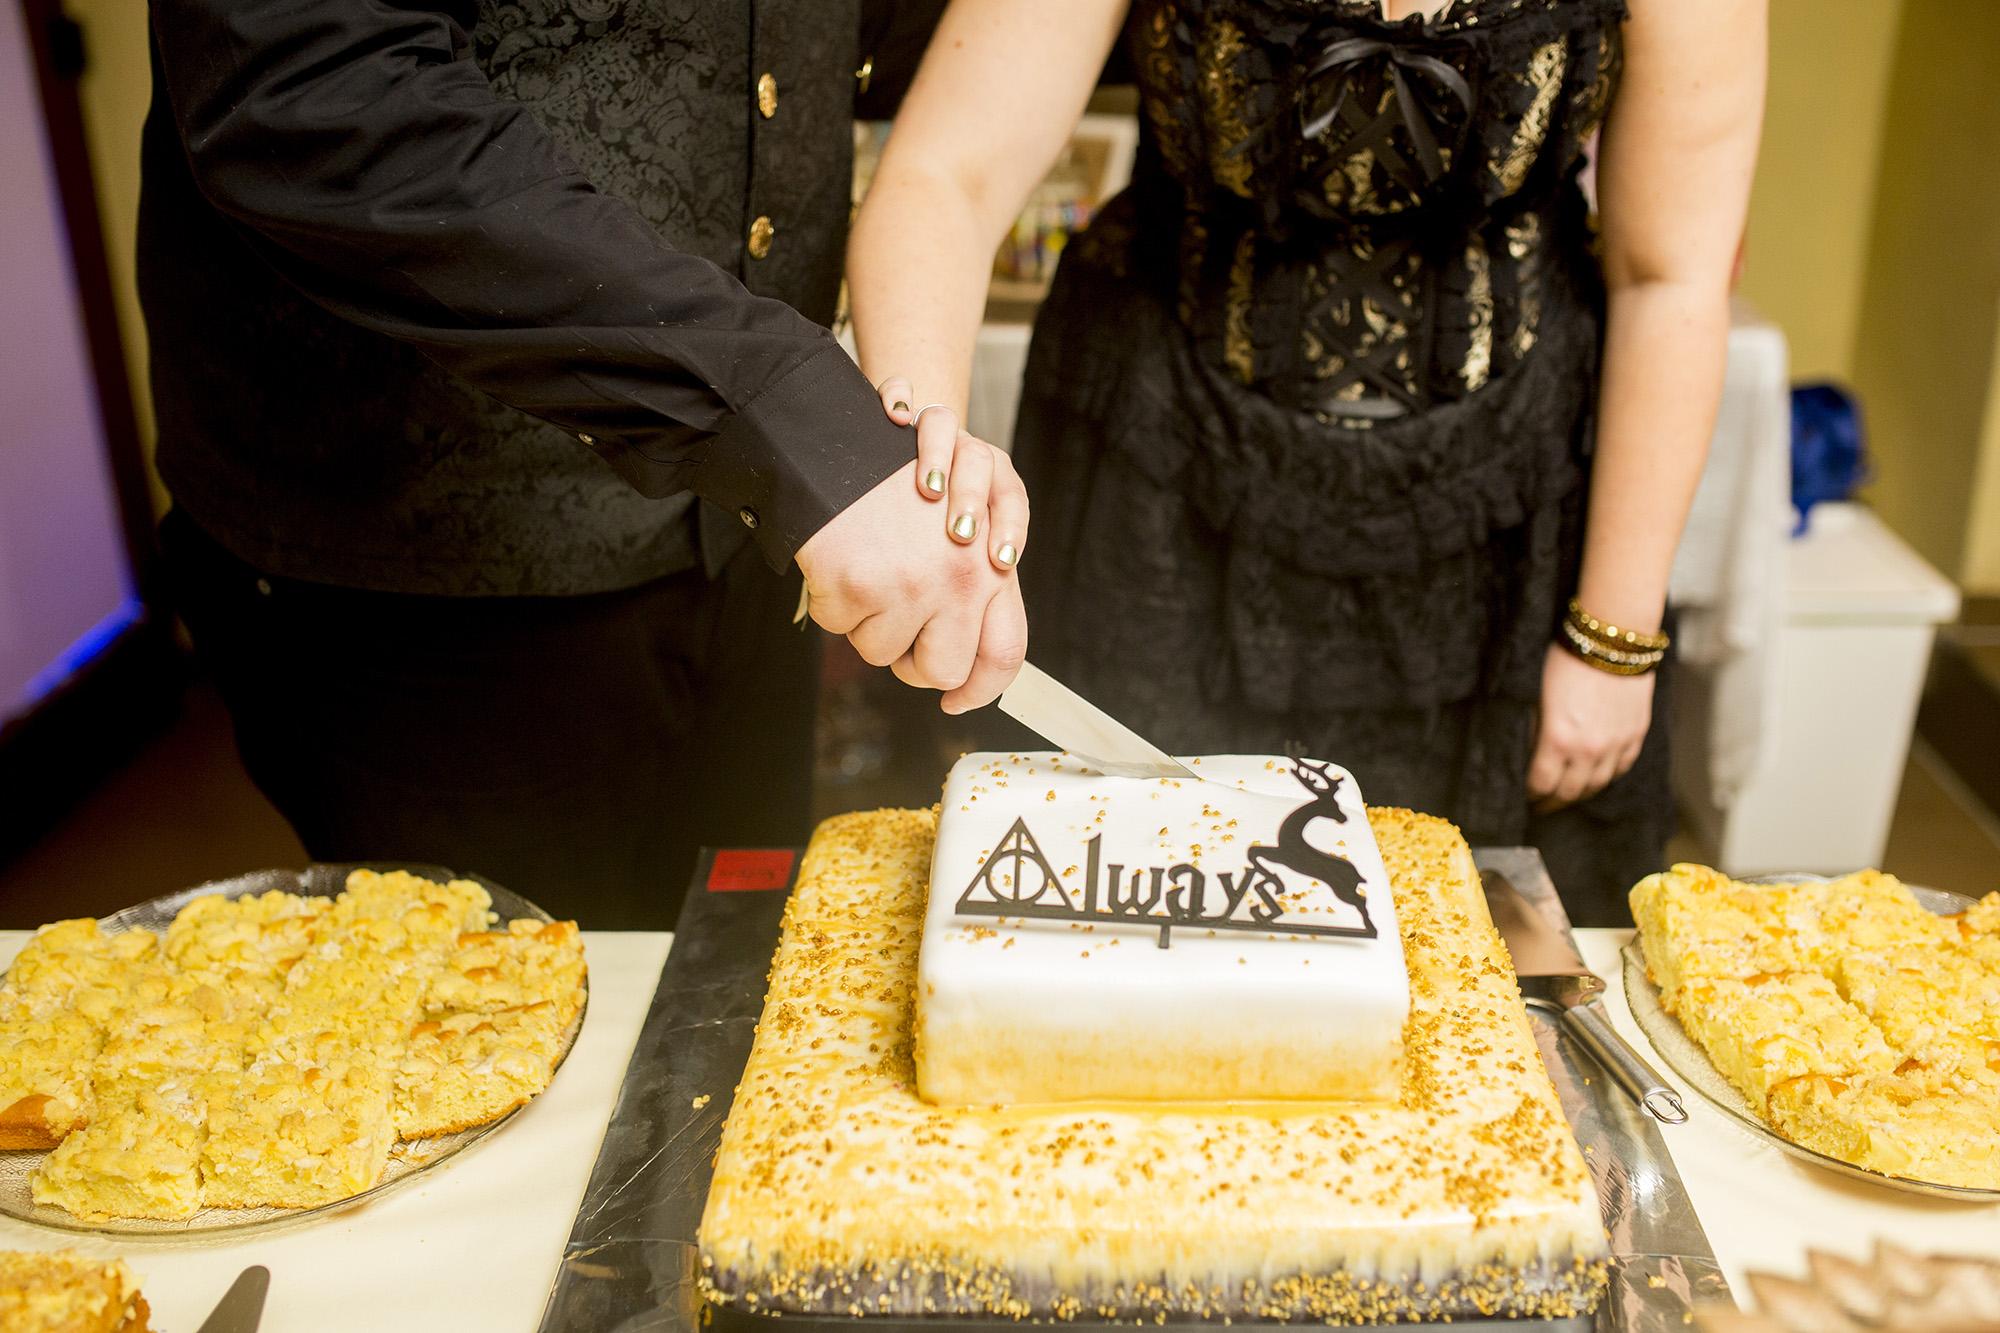 Seriously_Sabrina_Photography_Essen_Germany_RocknRoll_Hochzeit_Wedding_PatrickJenny94.jpg